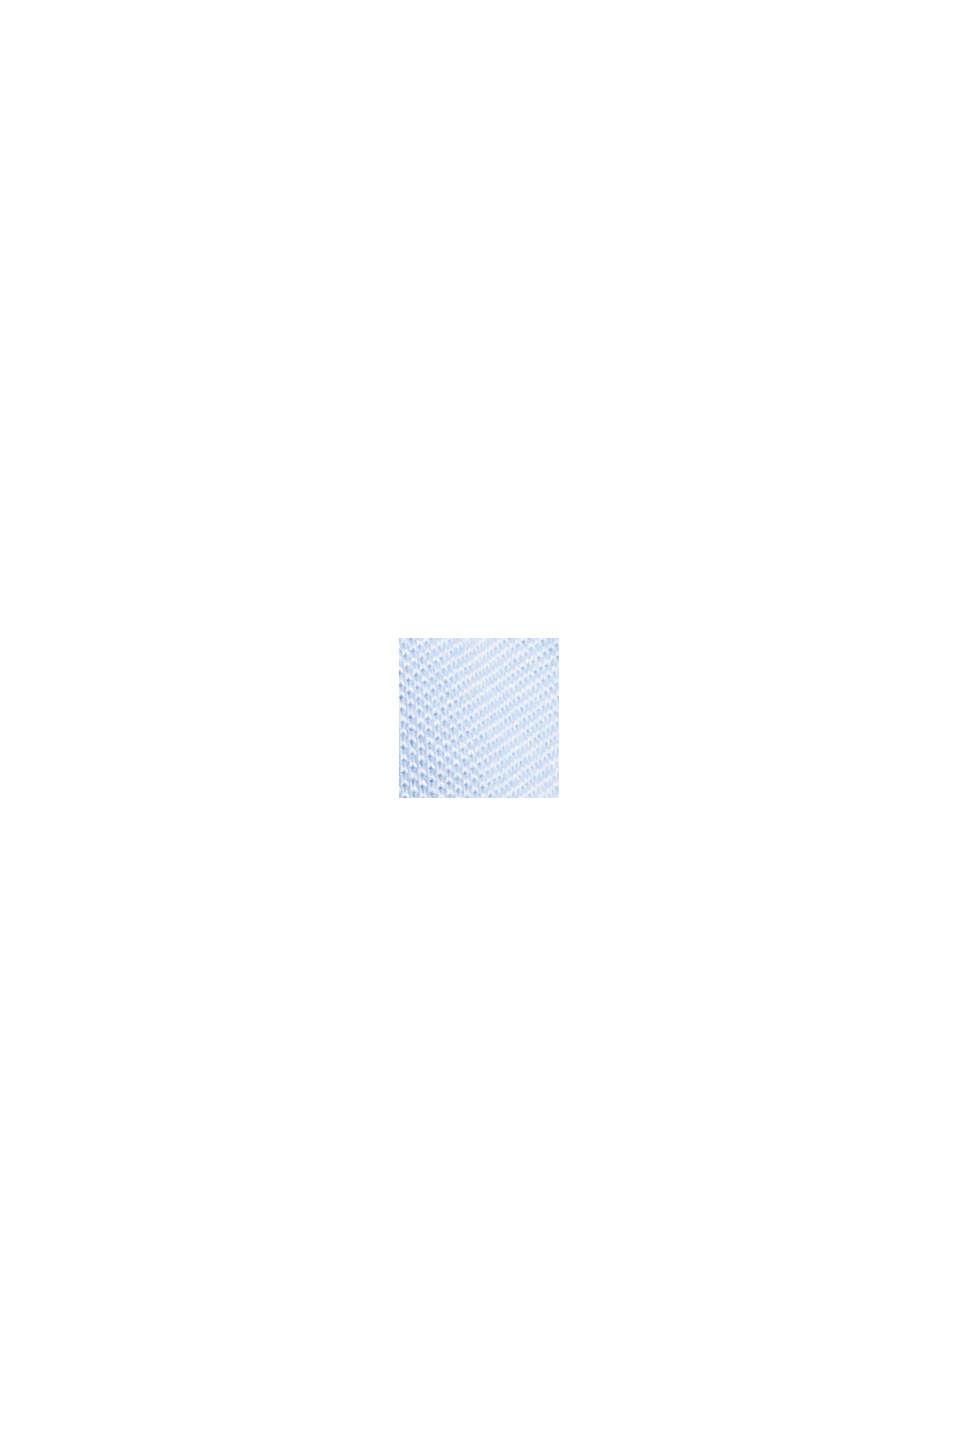 Jersey-Hemd aus 100% Baumwolle, LIGHT BLUE, swatch